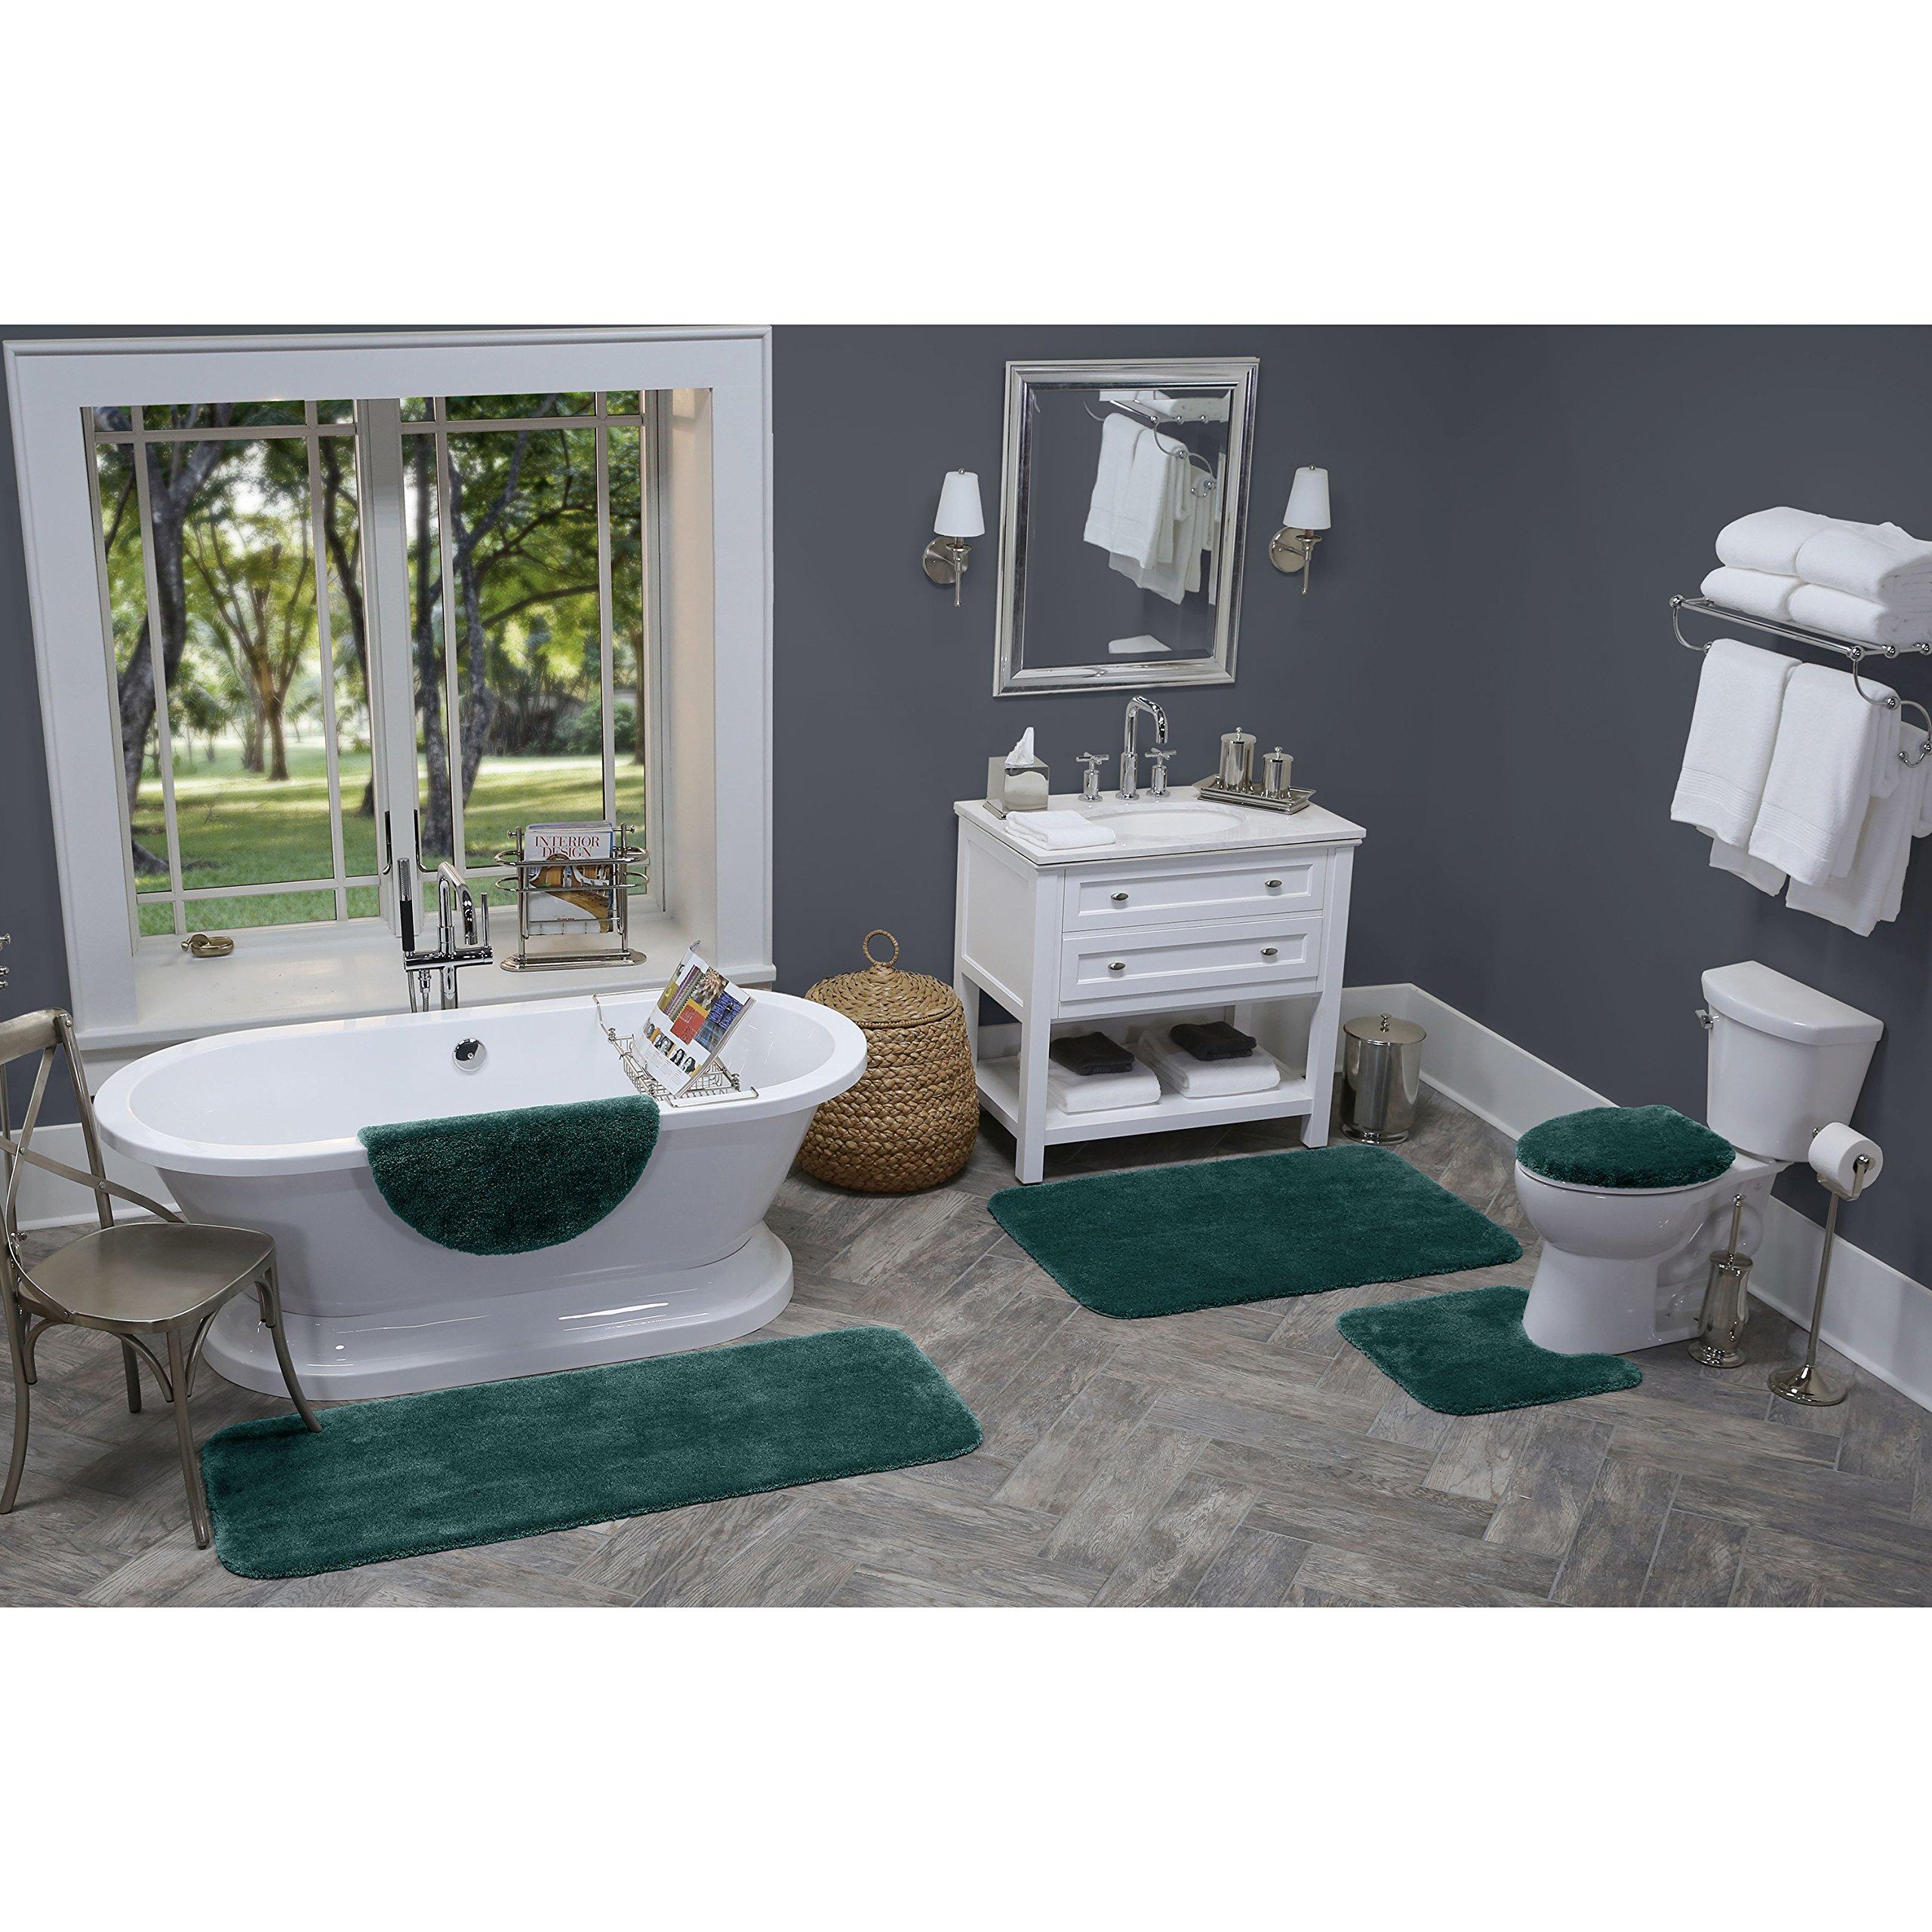 Maples Rugs Bathroom Rugs - Cloud Bath 20'' x 34'' Washable Non Slip Bath Mat [Made in USA] for Kitchen, Shower, and Bathroom, Teal Quartz